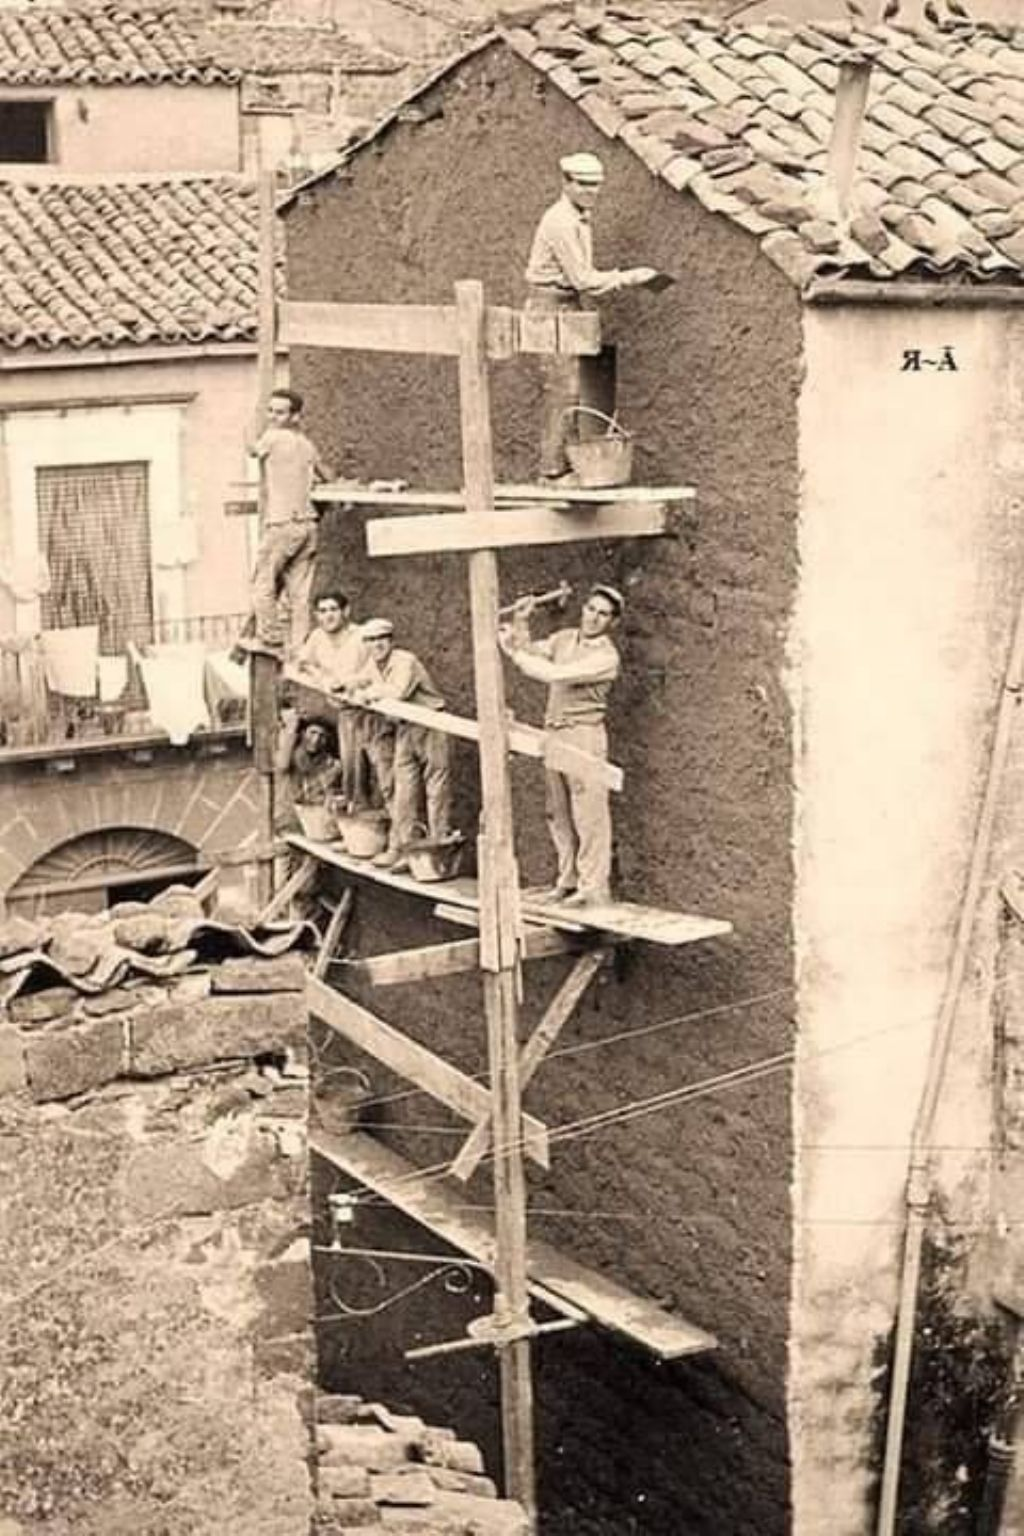 Cantiere edile ( in sicurezza, foto dal web)